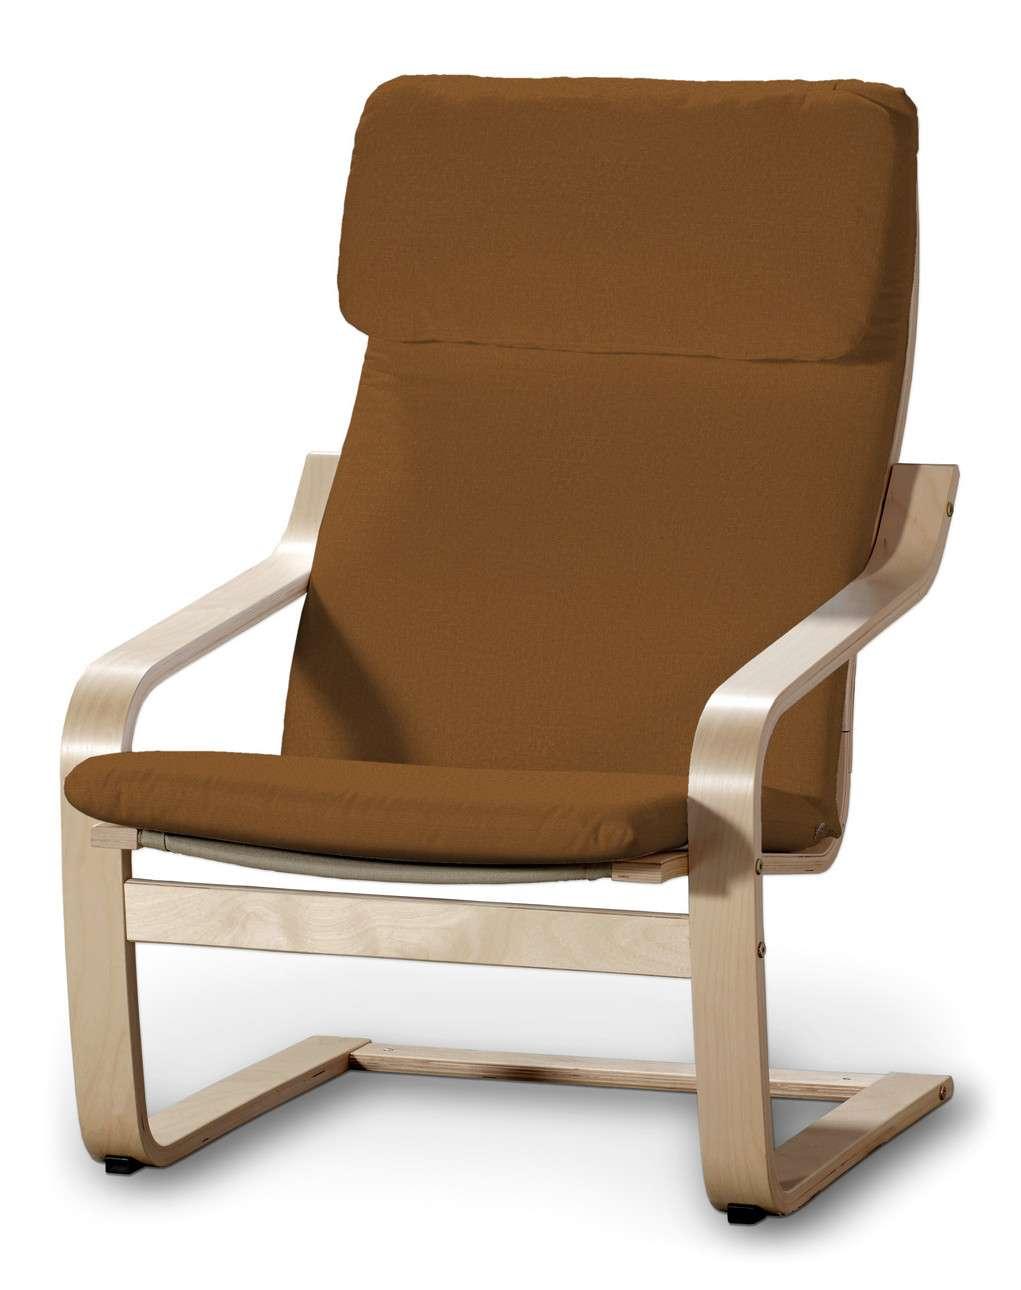 Poduszka na fotel Poäng w kolekcji Living, tkanina: 161-28